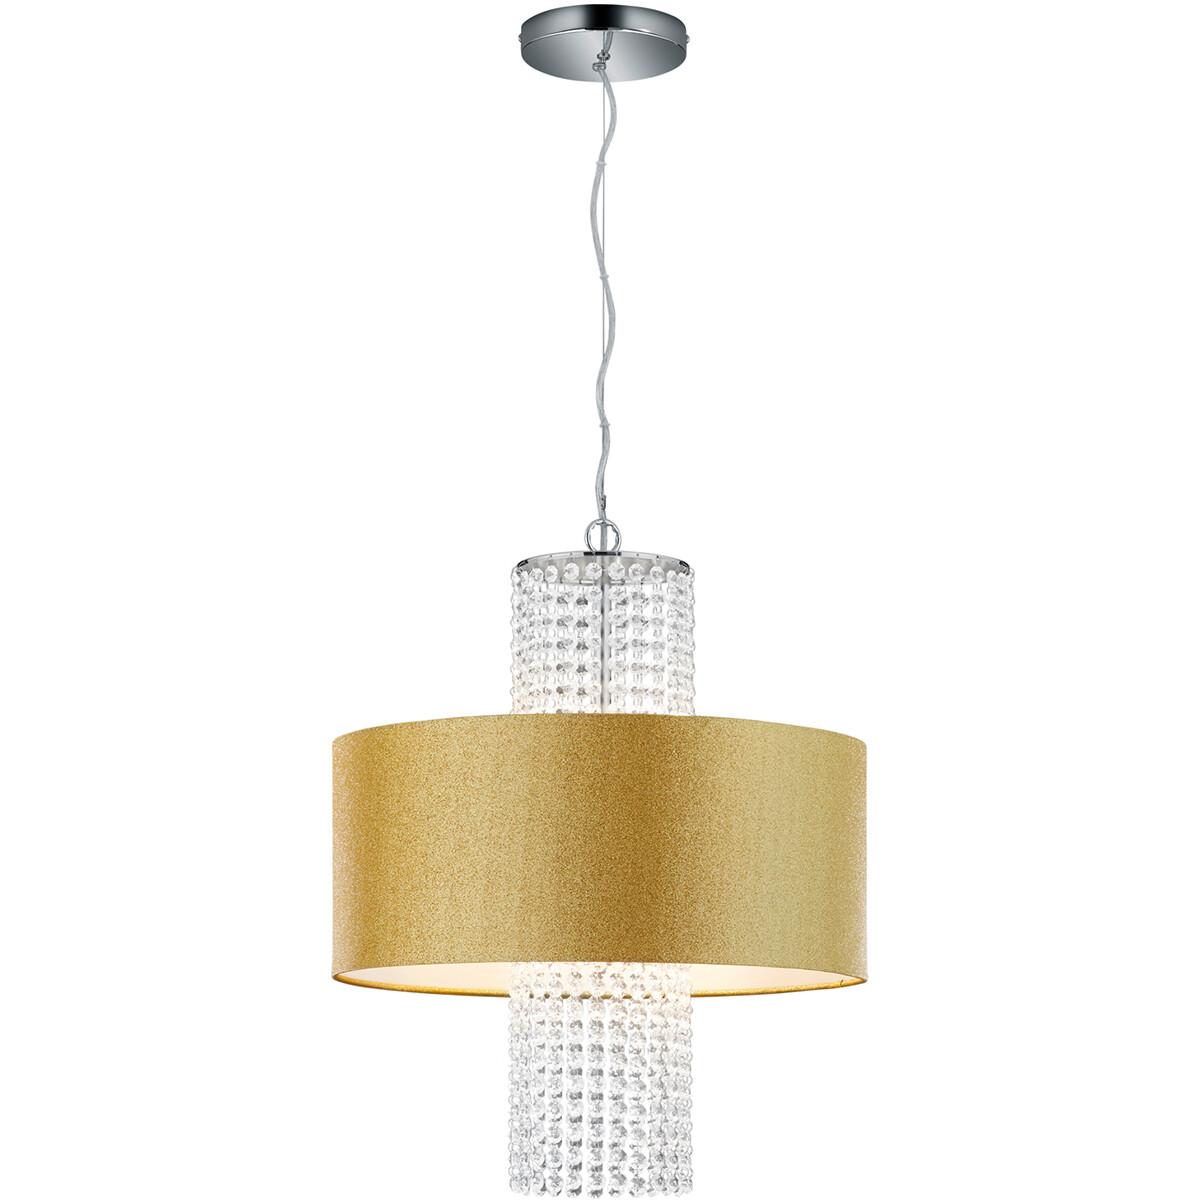 LED Hanglamp - Hangverlichting - Trion Kong - E14 Fitting - 3-lichts - Rond - Mat Goud - Aluminium